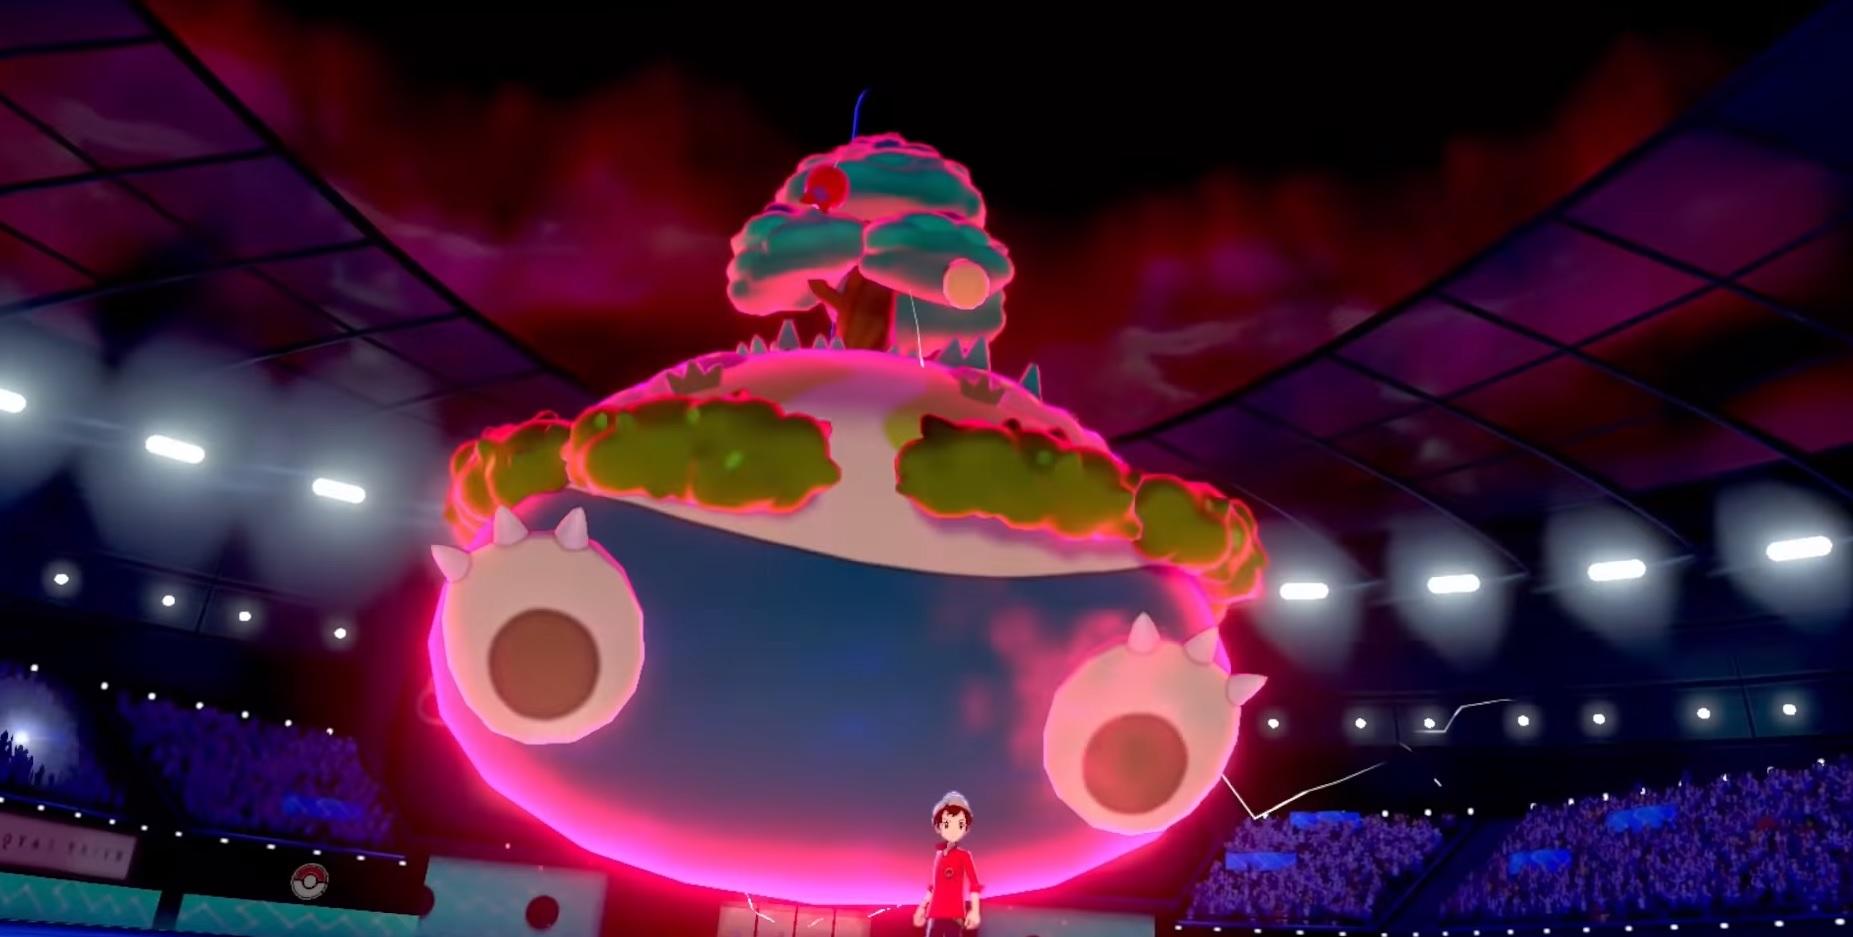 Behold: Pokemon Sword and Shield's Gigantamax Snorlax screenshot